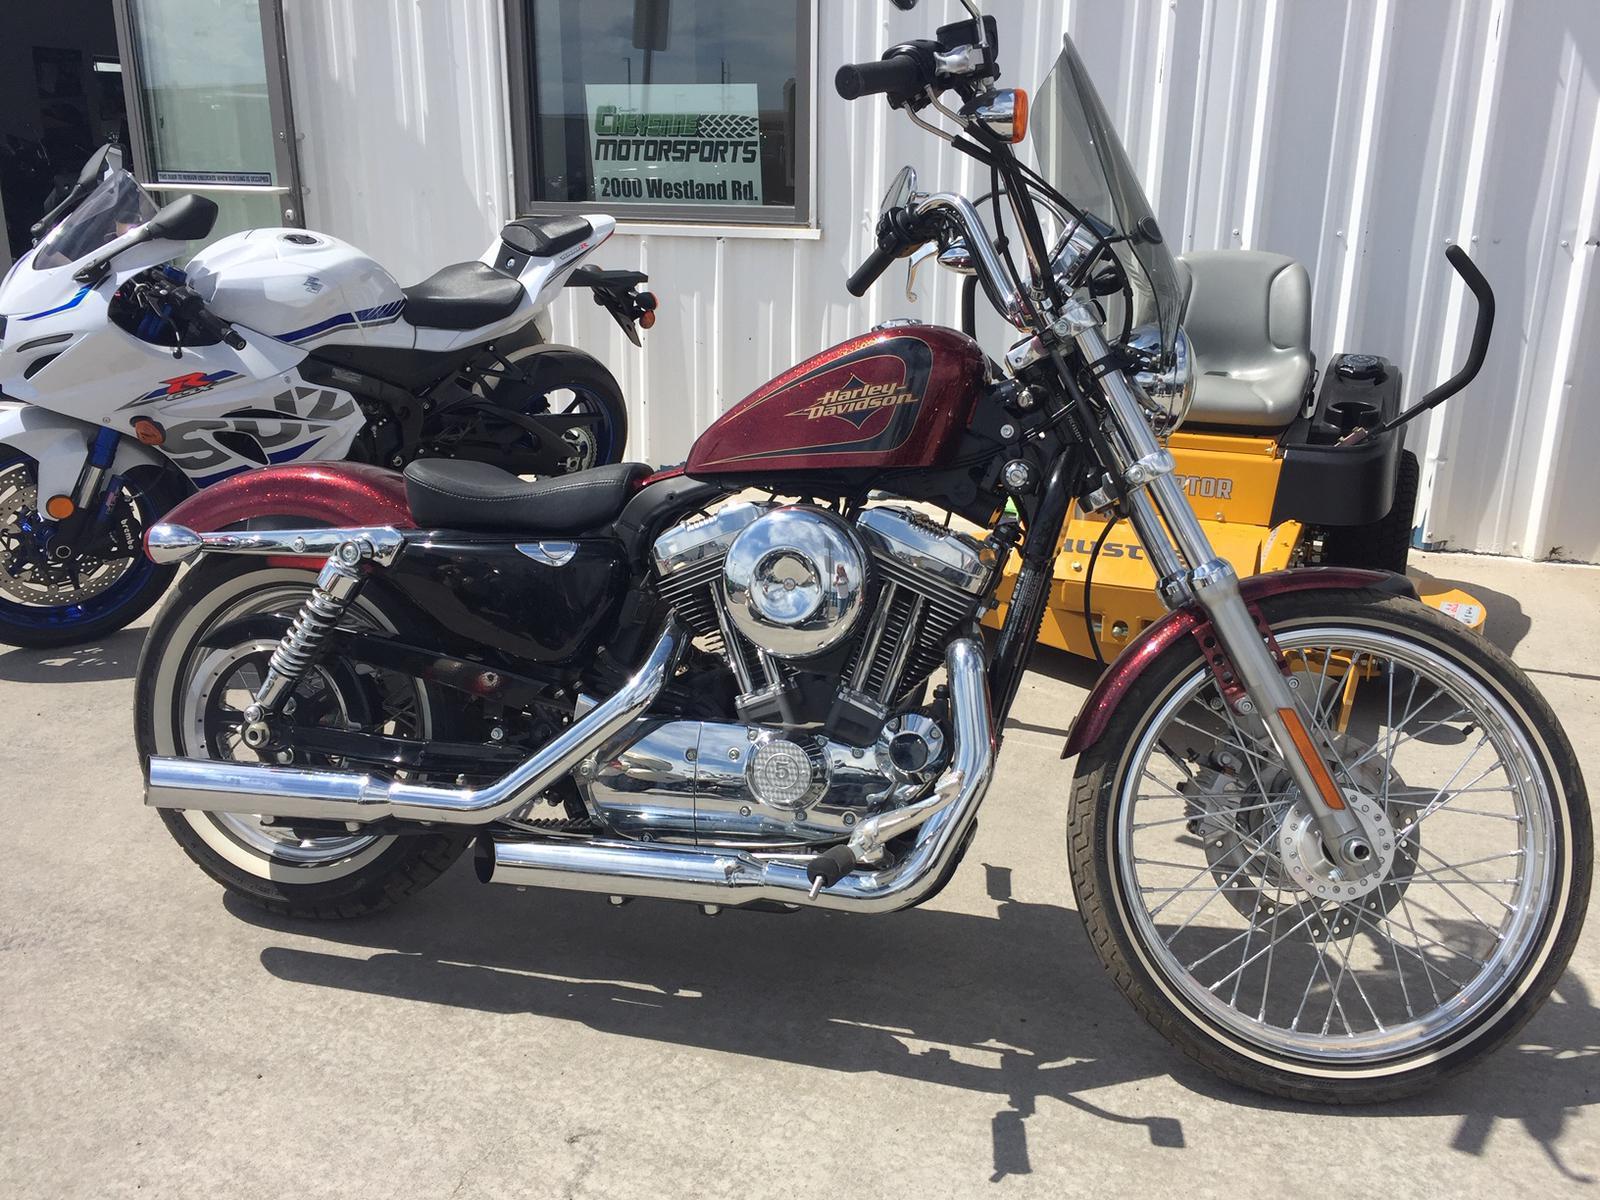 2013 Harley-Davidson® Sportster Seventy-Two